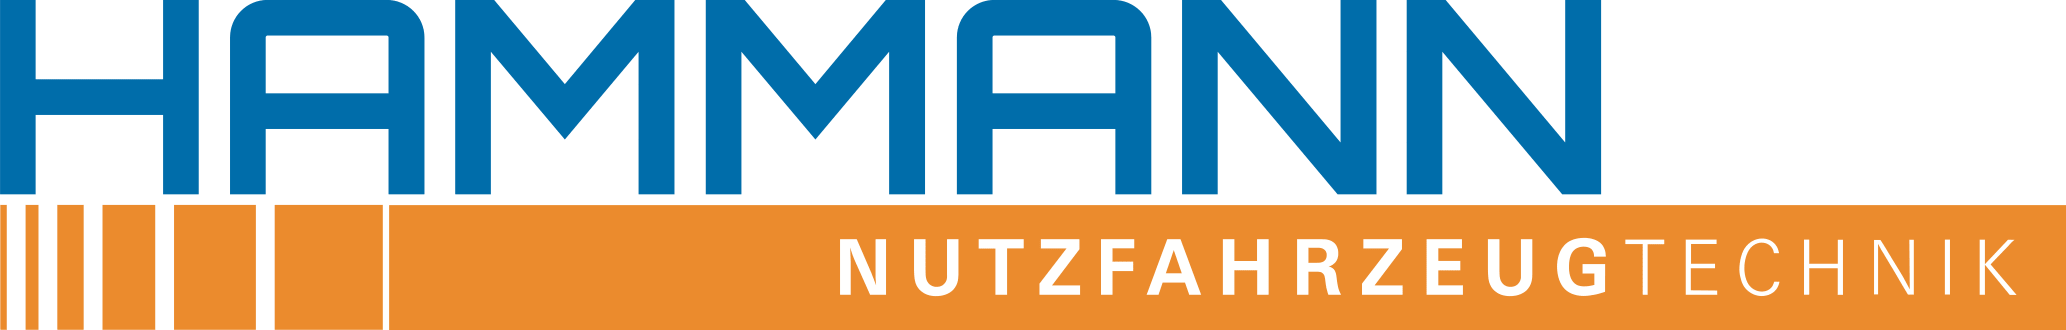 Hammann Nutzfahrzeugtechnik GmbH